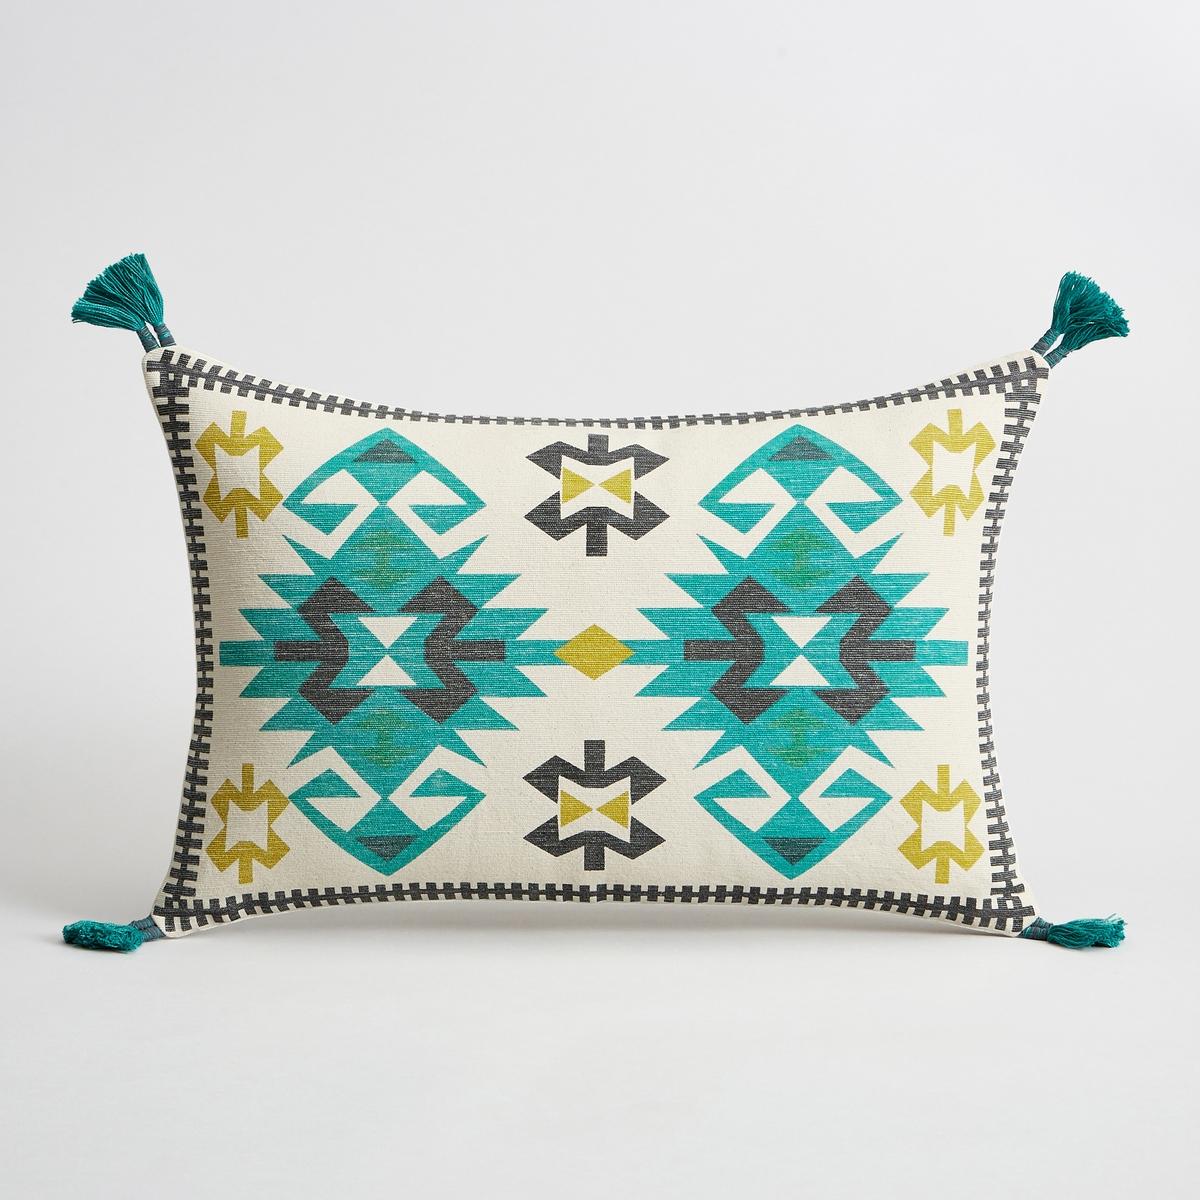 Наволочка на подушку-валик зеленого цвета Boissonie<br><br>Цвет: зеленый<br>Размер: 60 x 40  см